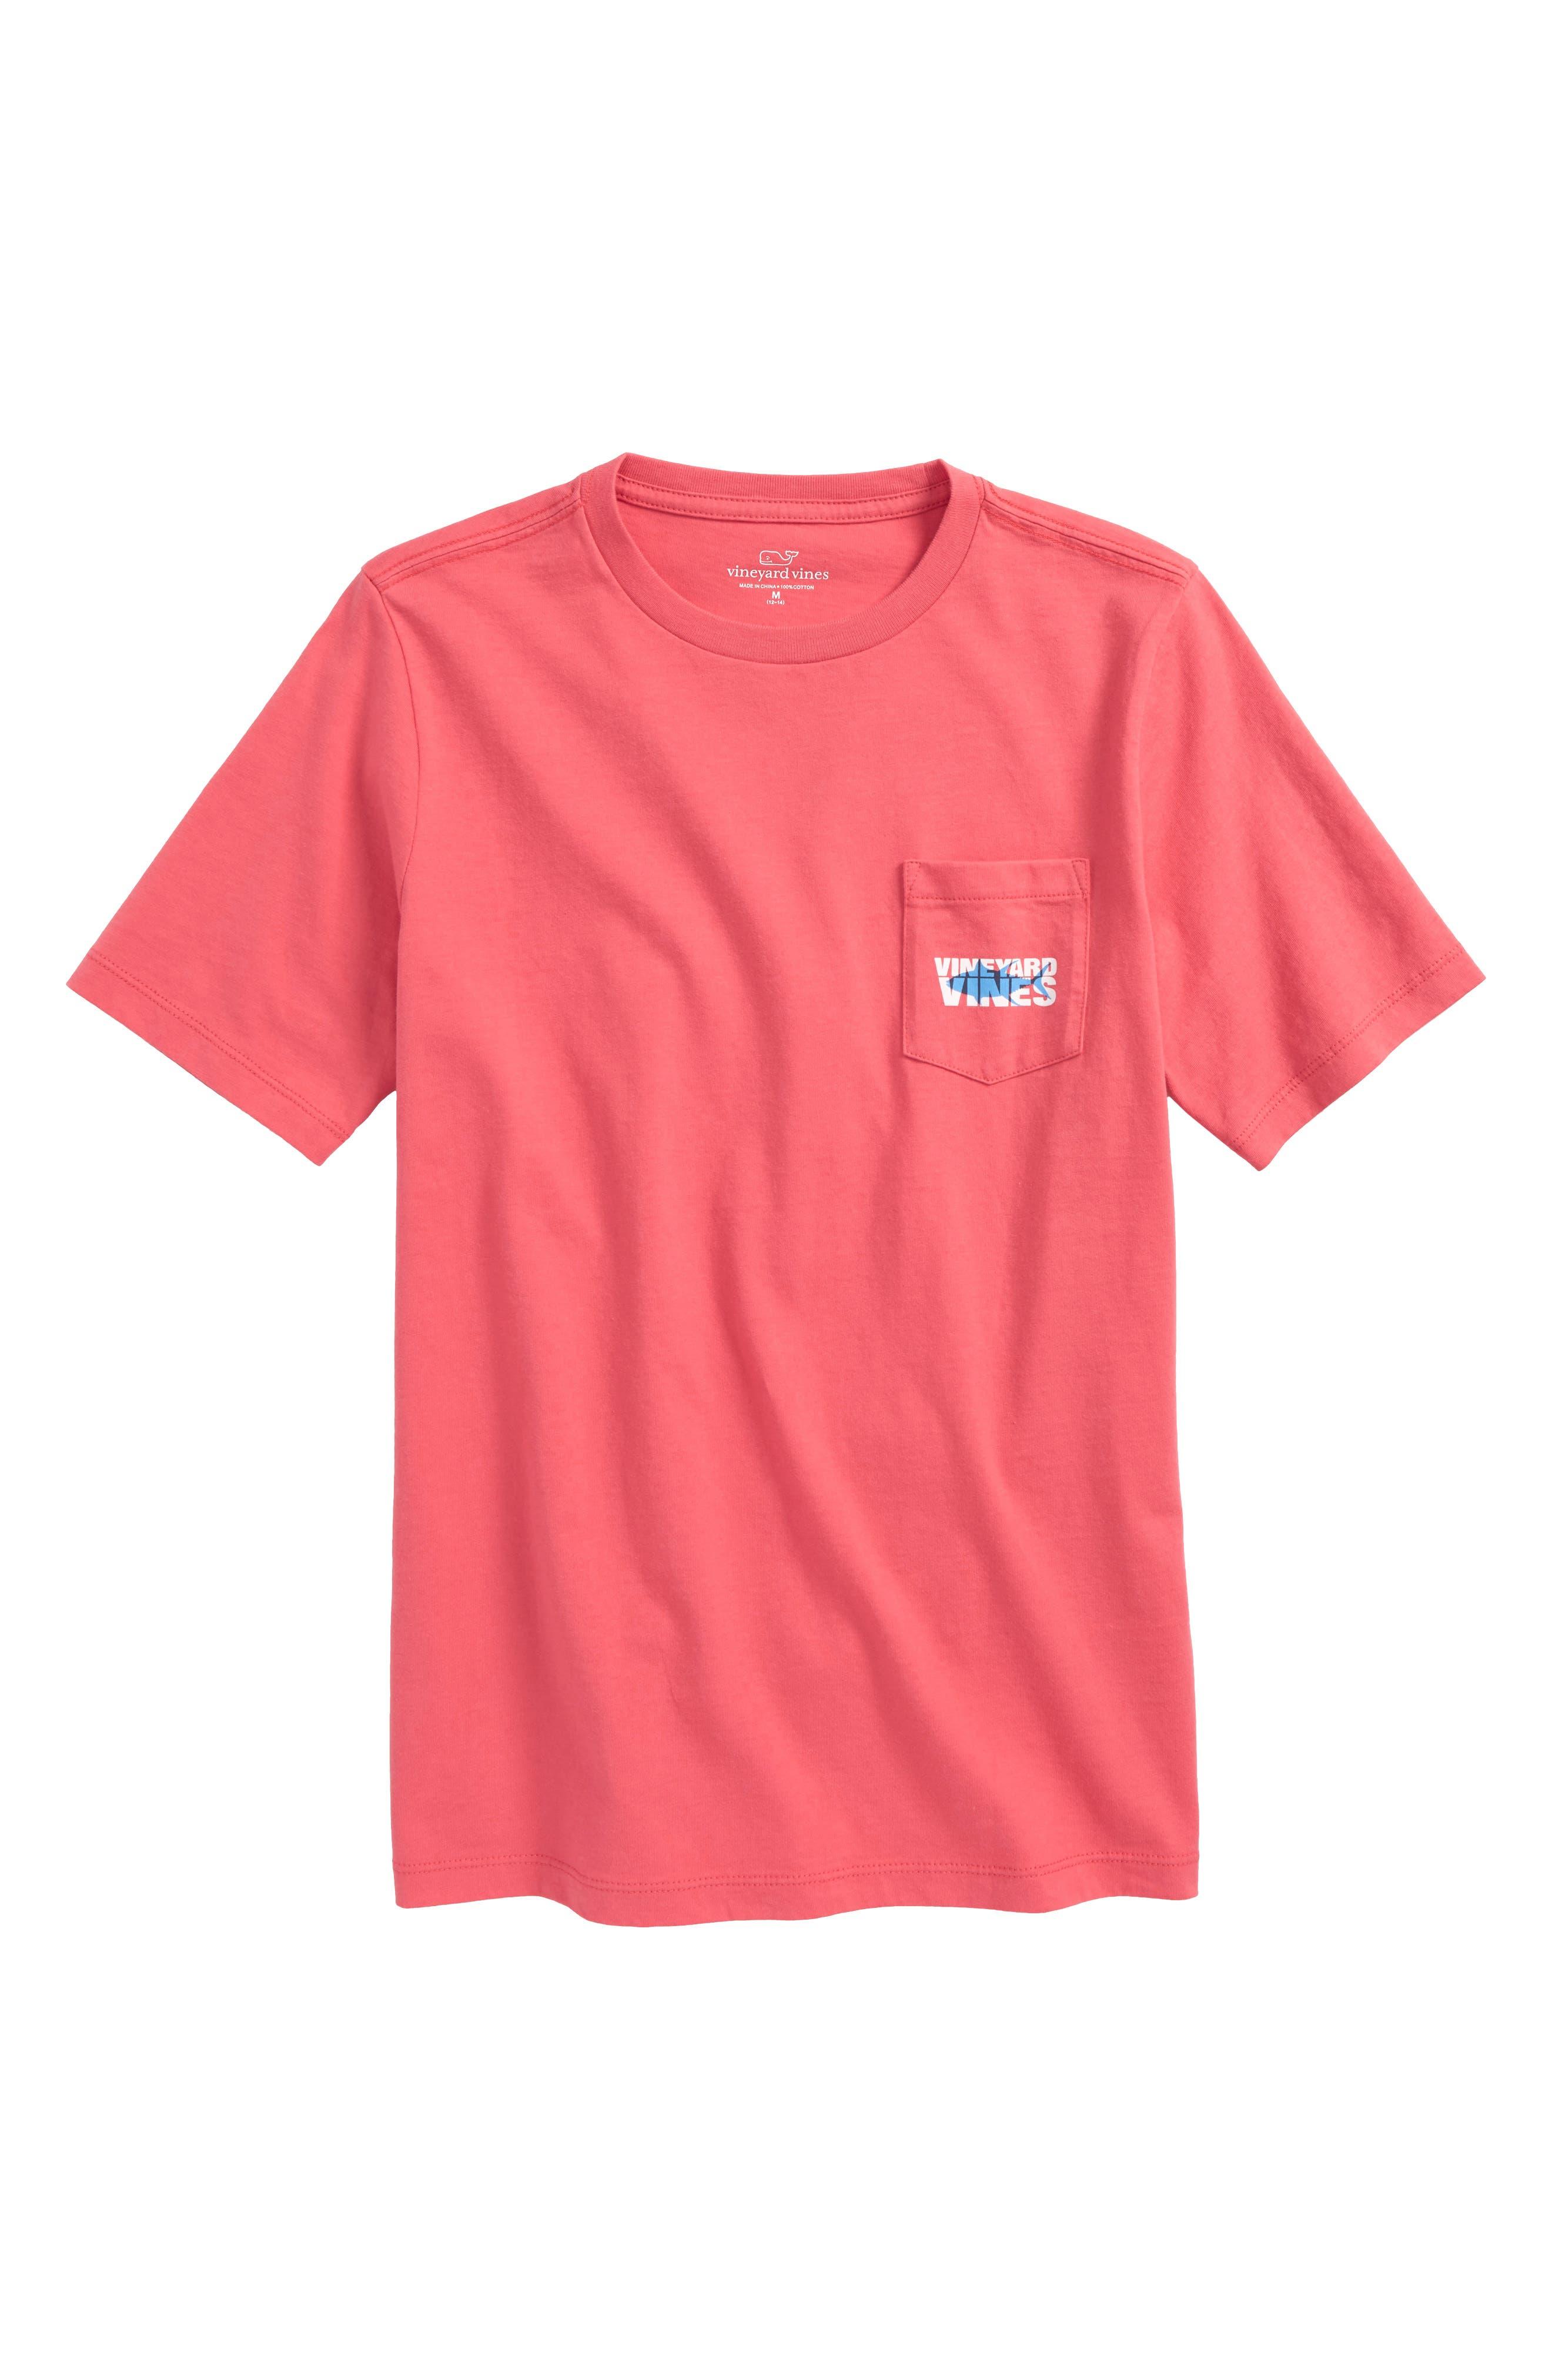 Tuna Shadows Pocket T-Shirt,                         Main,                         color, Jetty Red